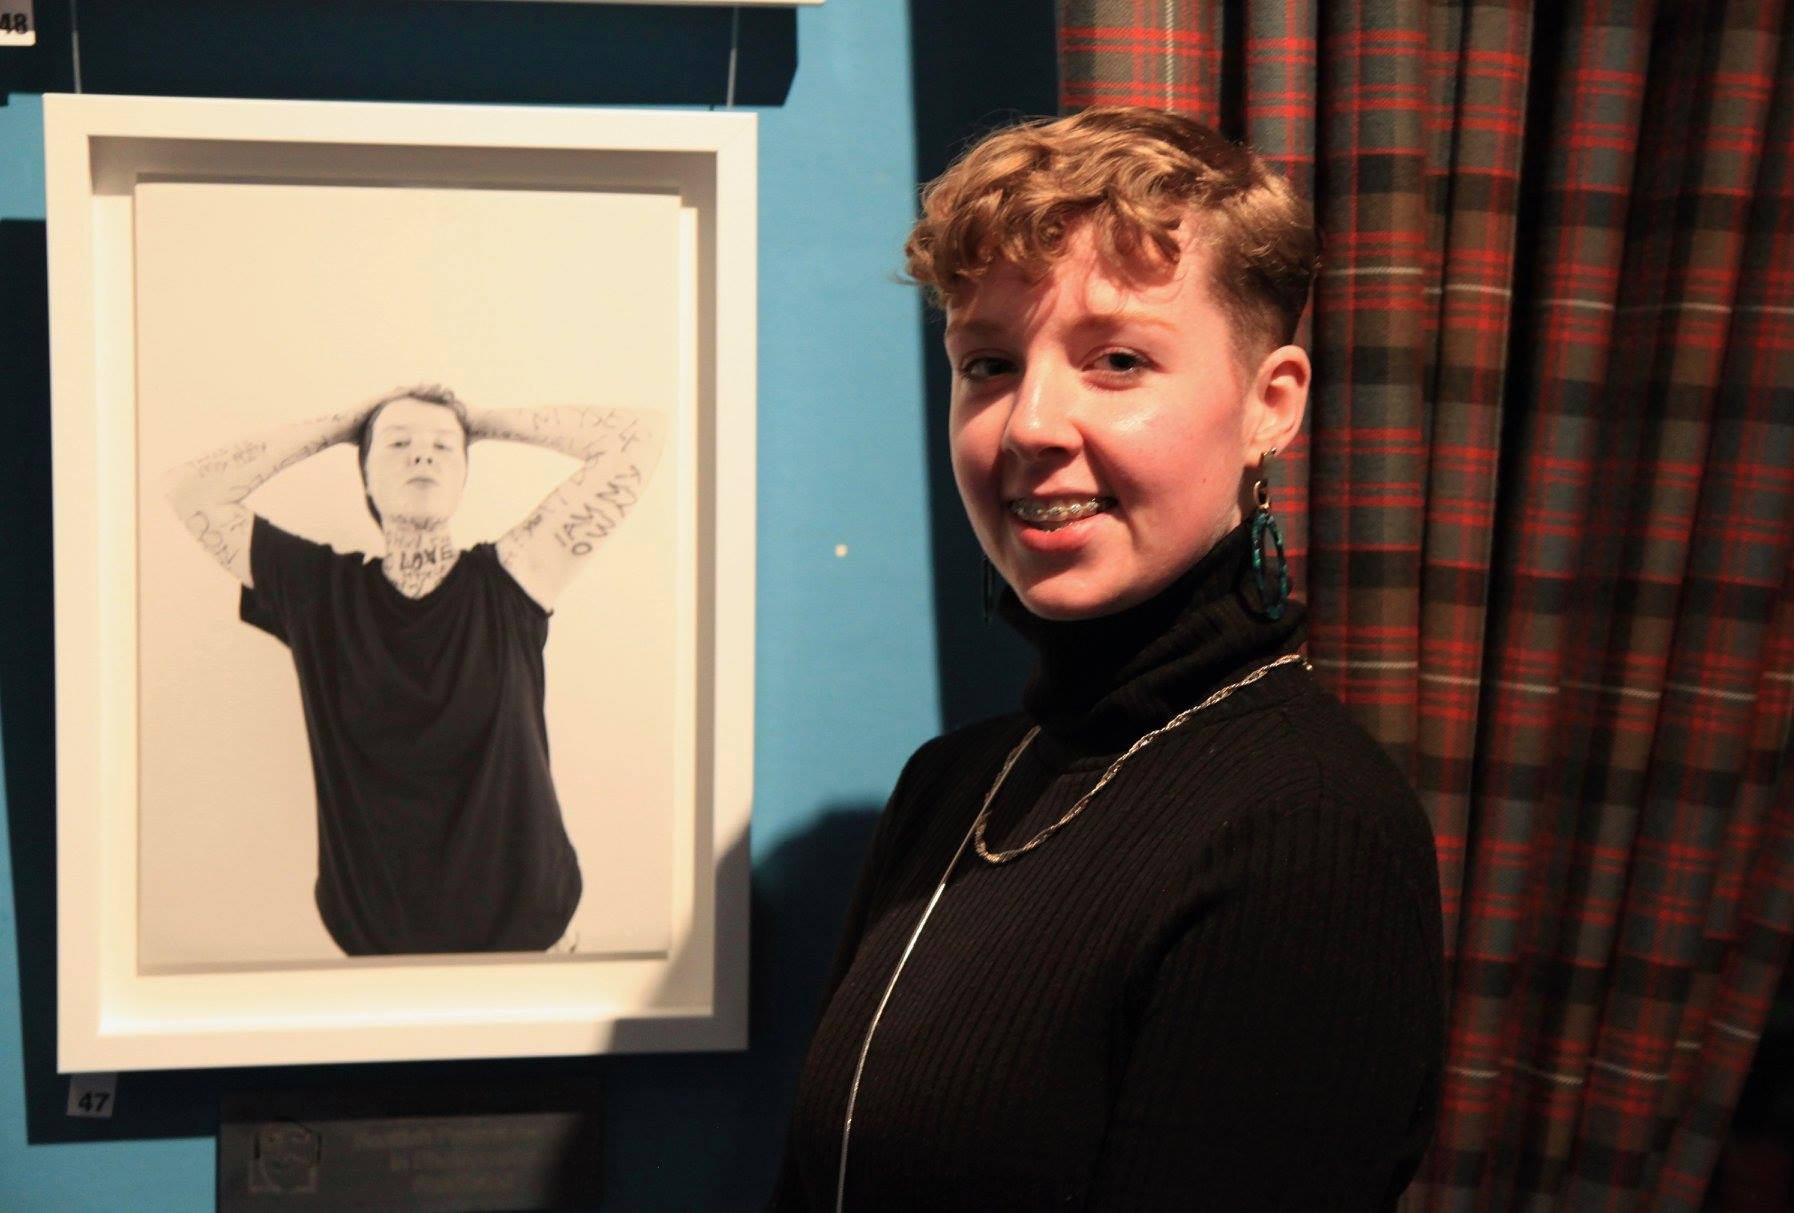 Eliza and her portrait at the SPA exhibition in Edinburgh, November 2018